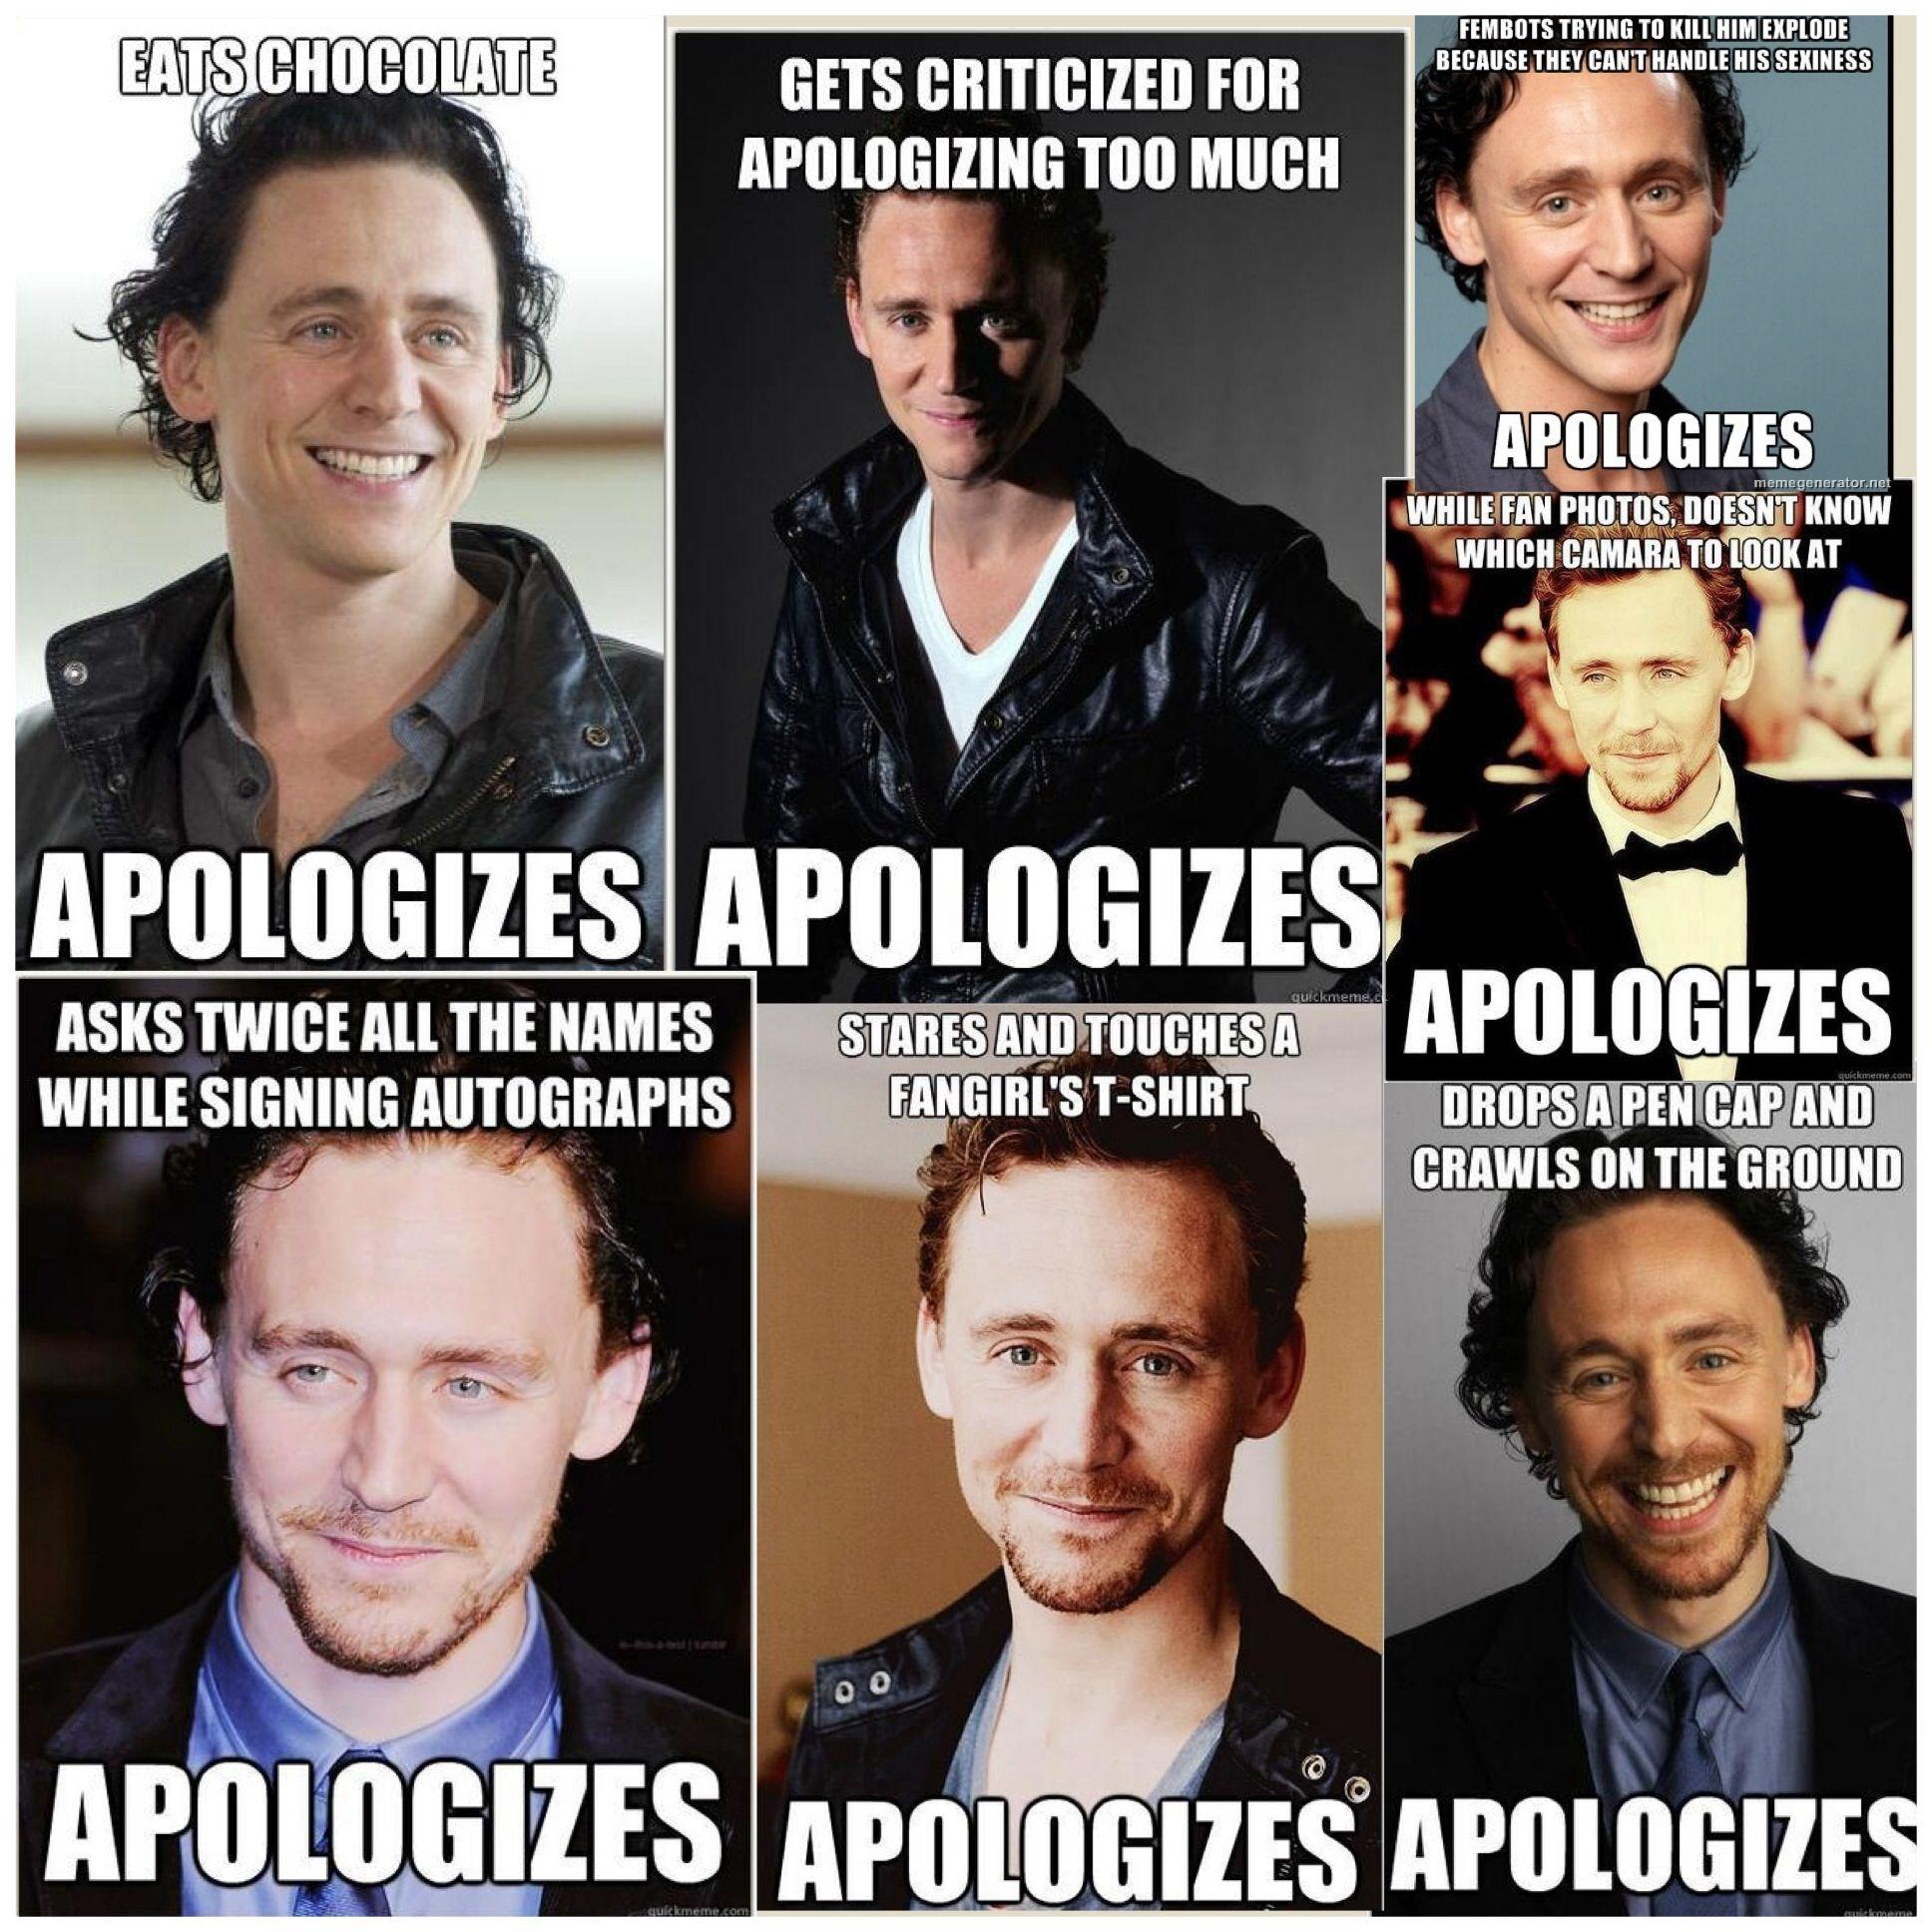 nice guy tom hiddleston he seems like such a sweet